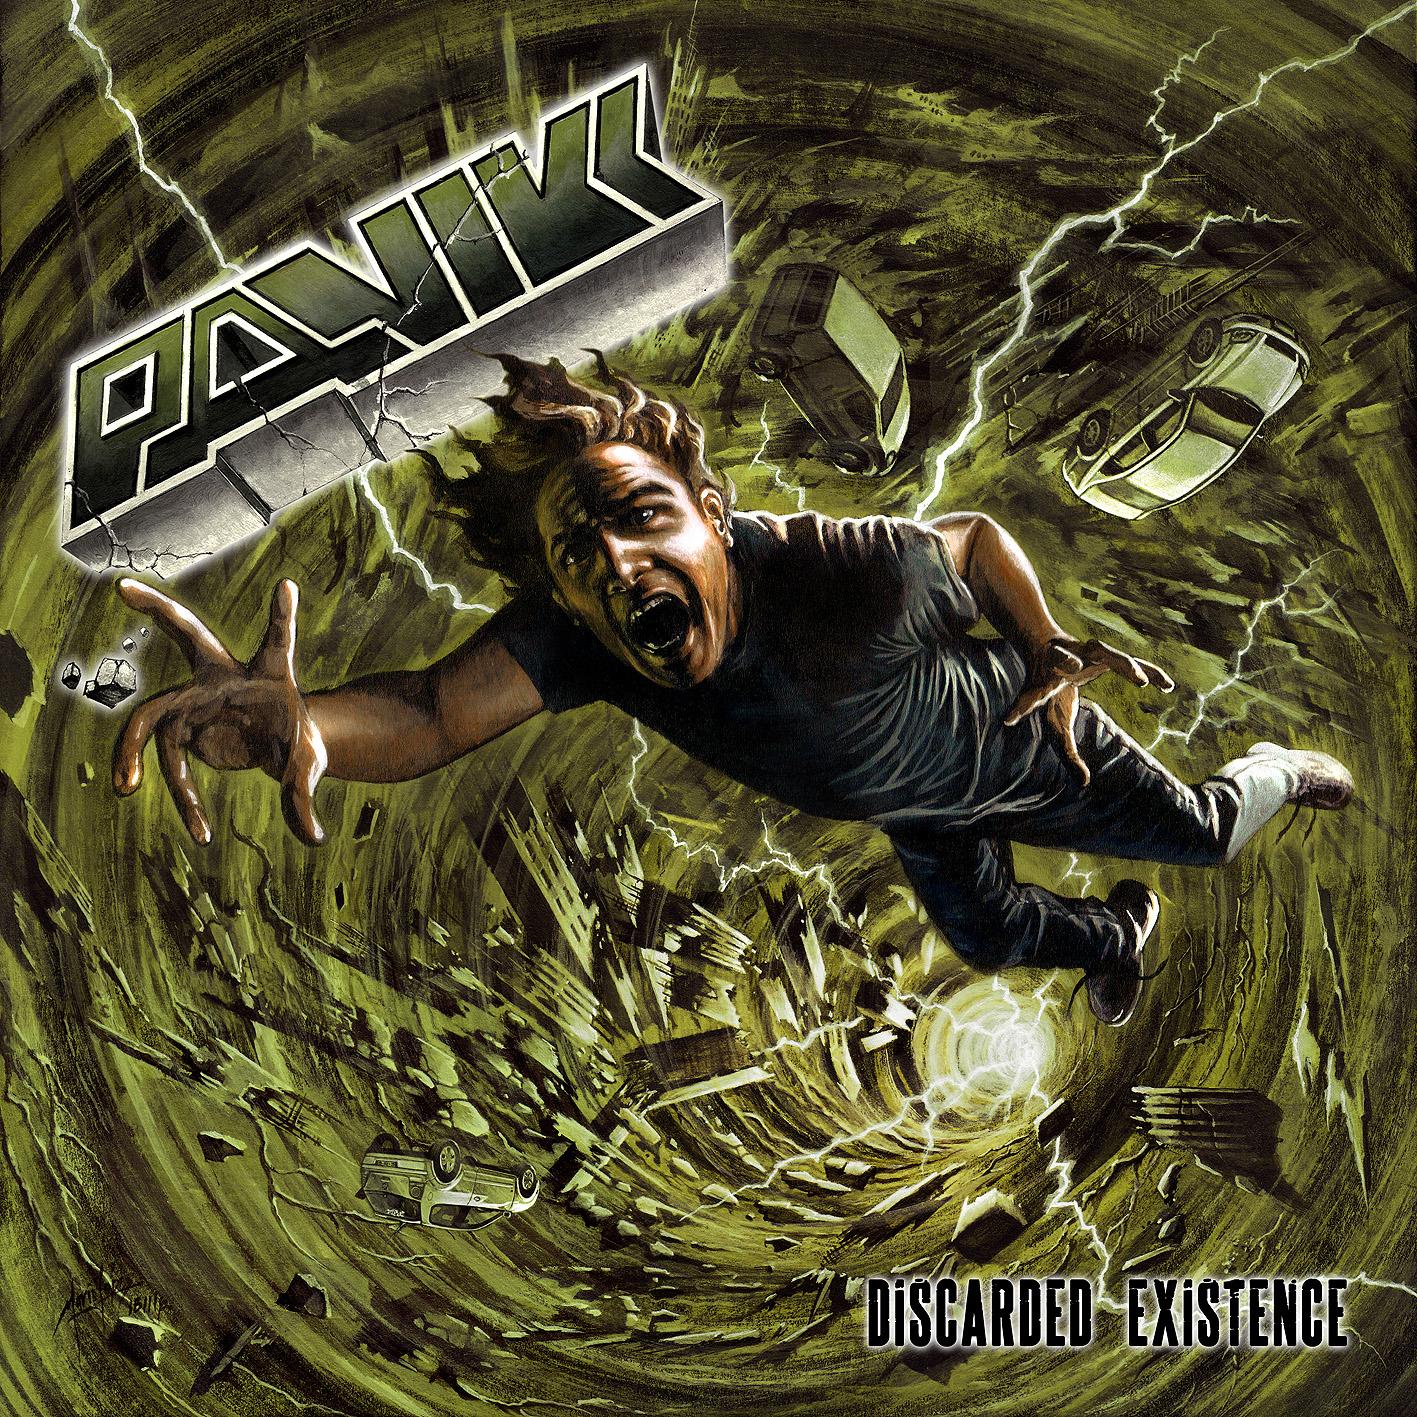 Panikk – Discarded Existence